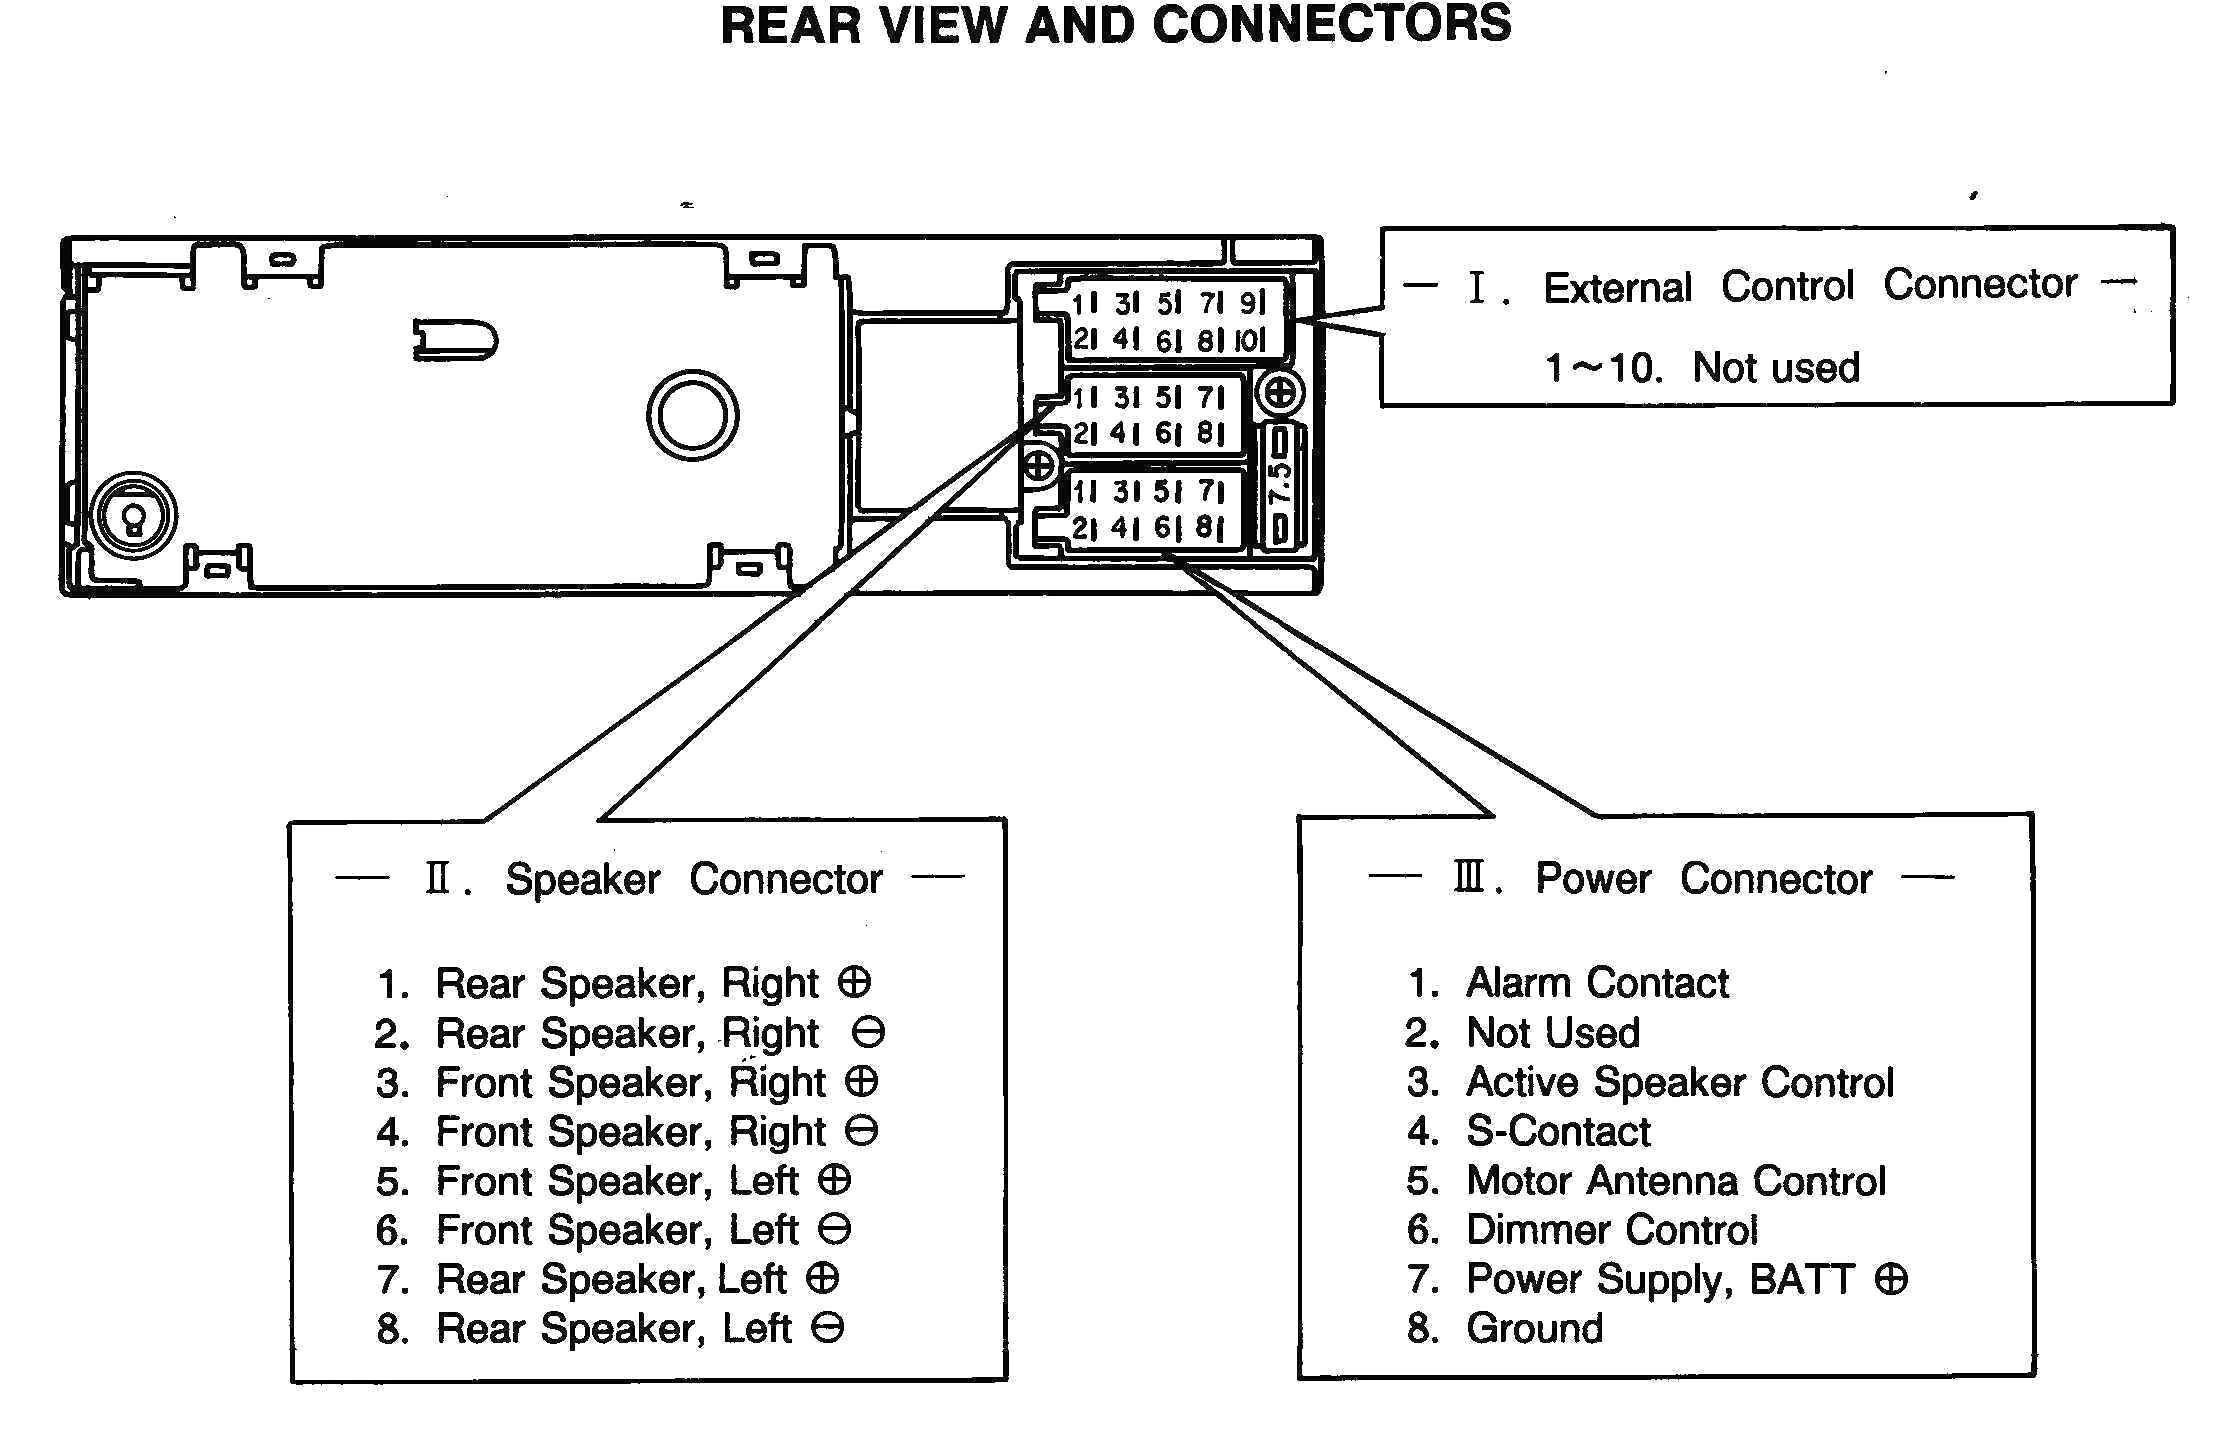 05 dodge durango stereo wiring diagram iveco daily radio 1999 new image